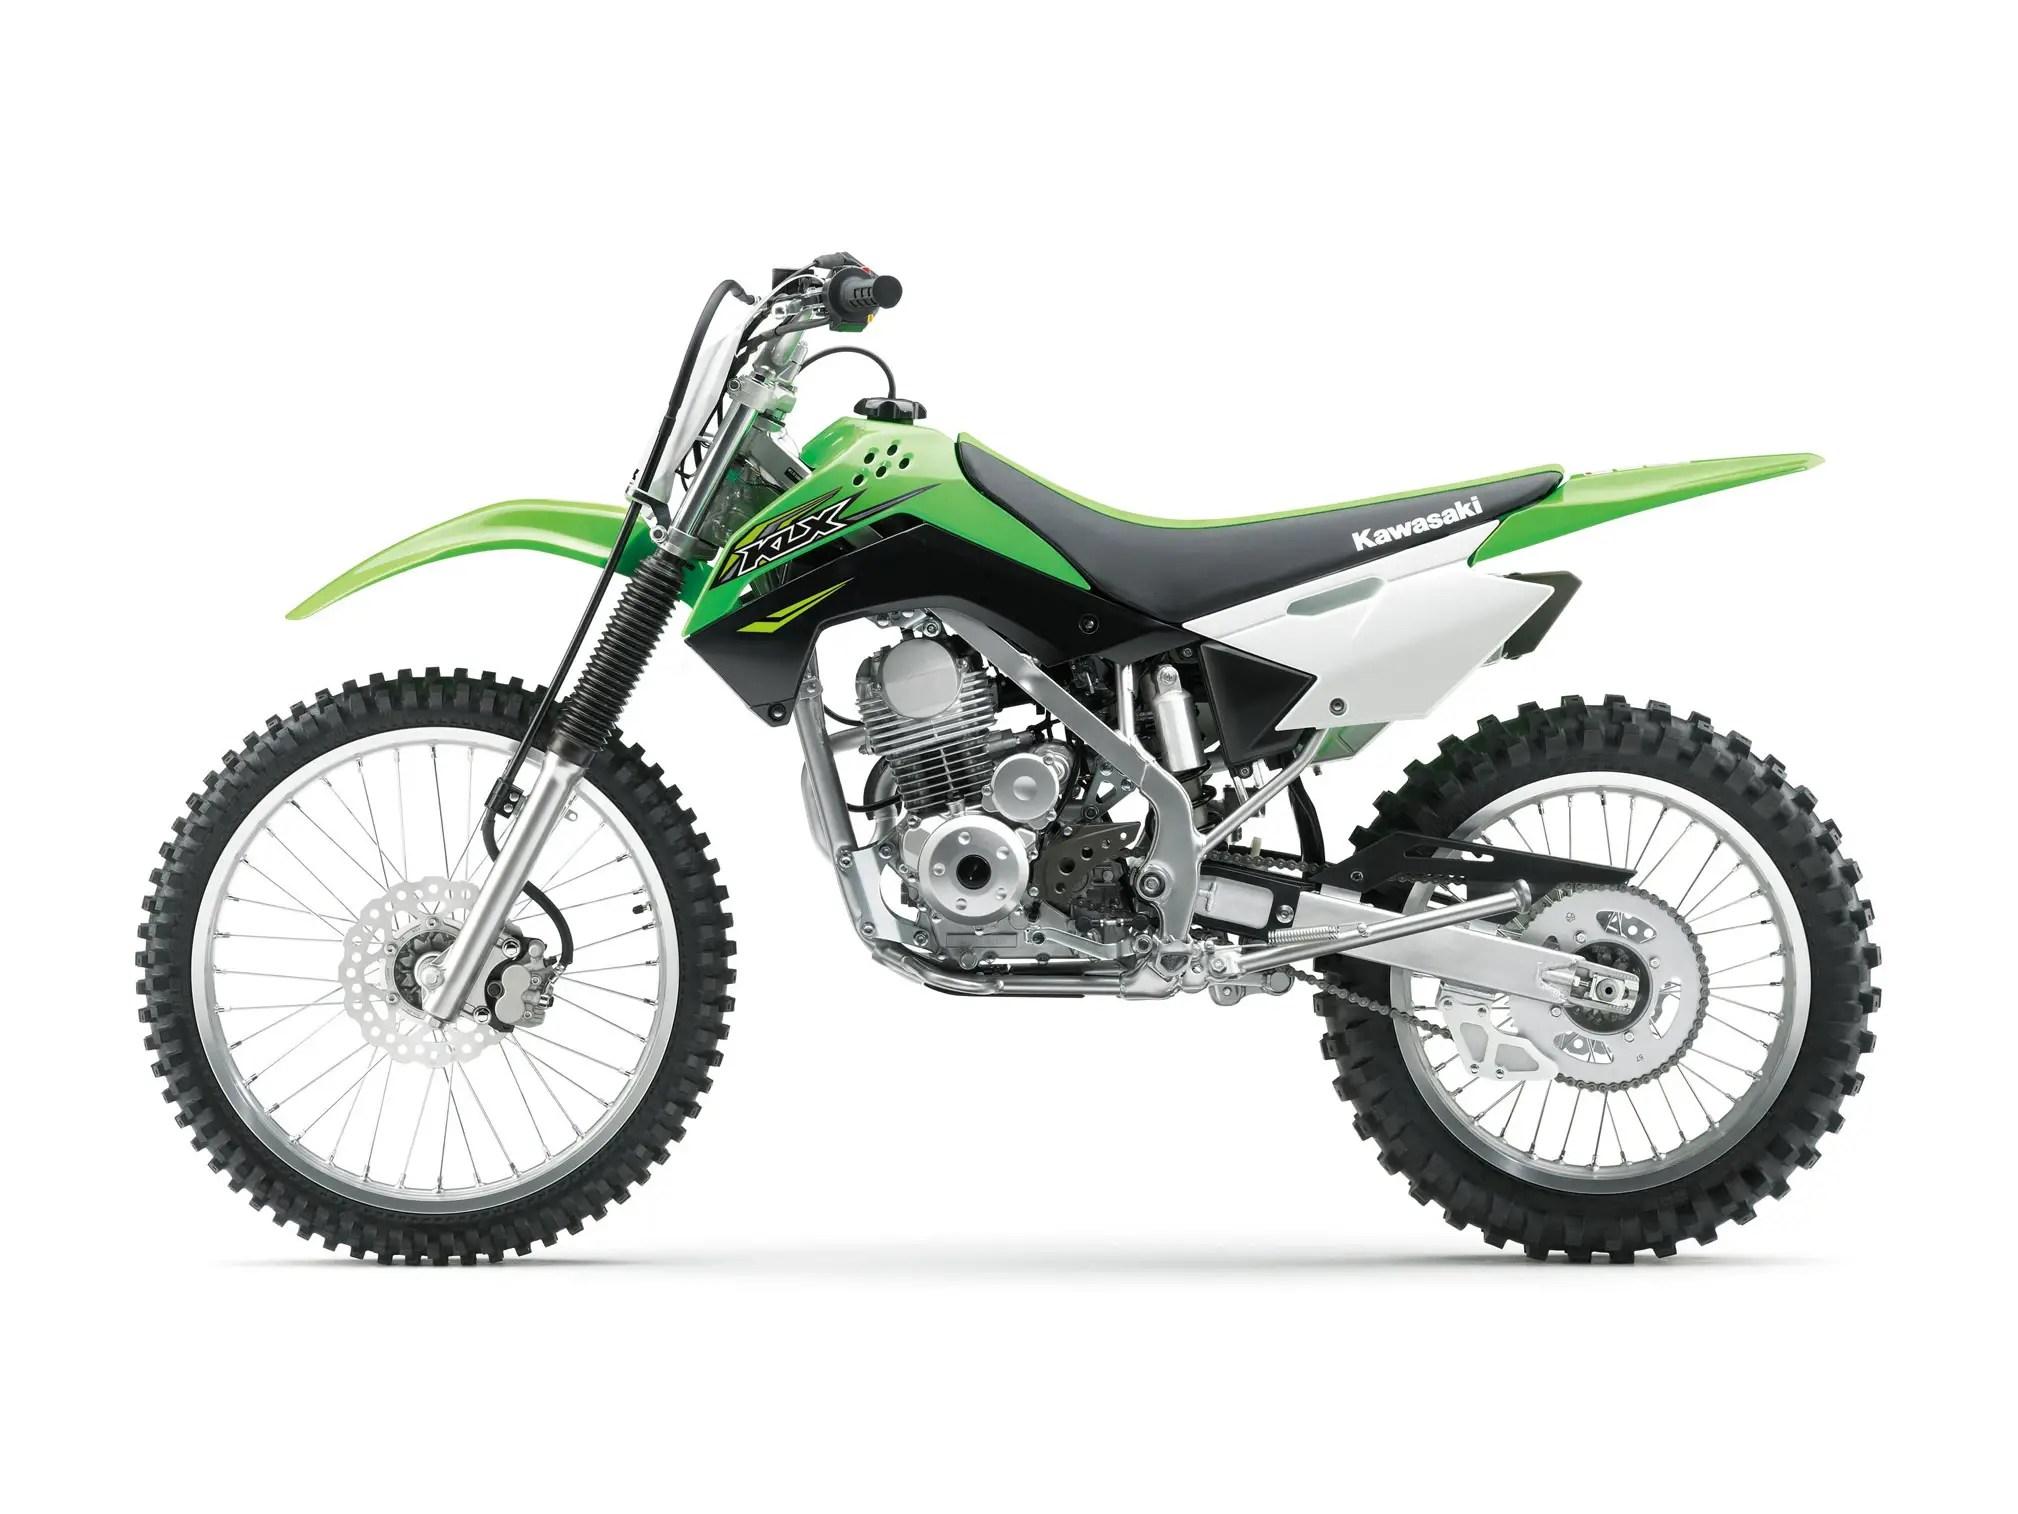 Kawasaki Klx140g Review Total Motorcycle